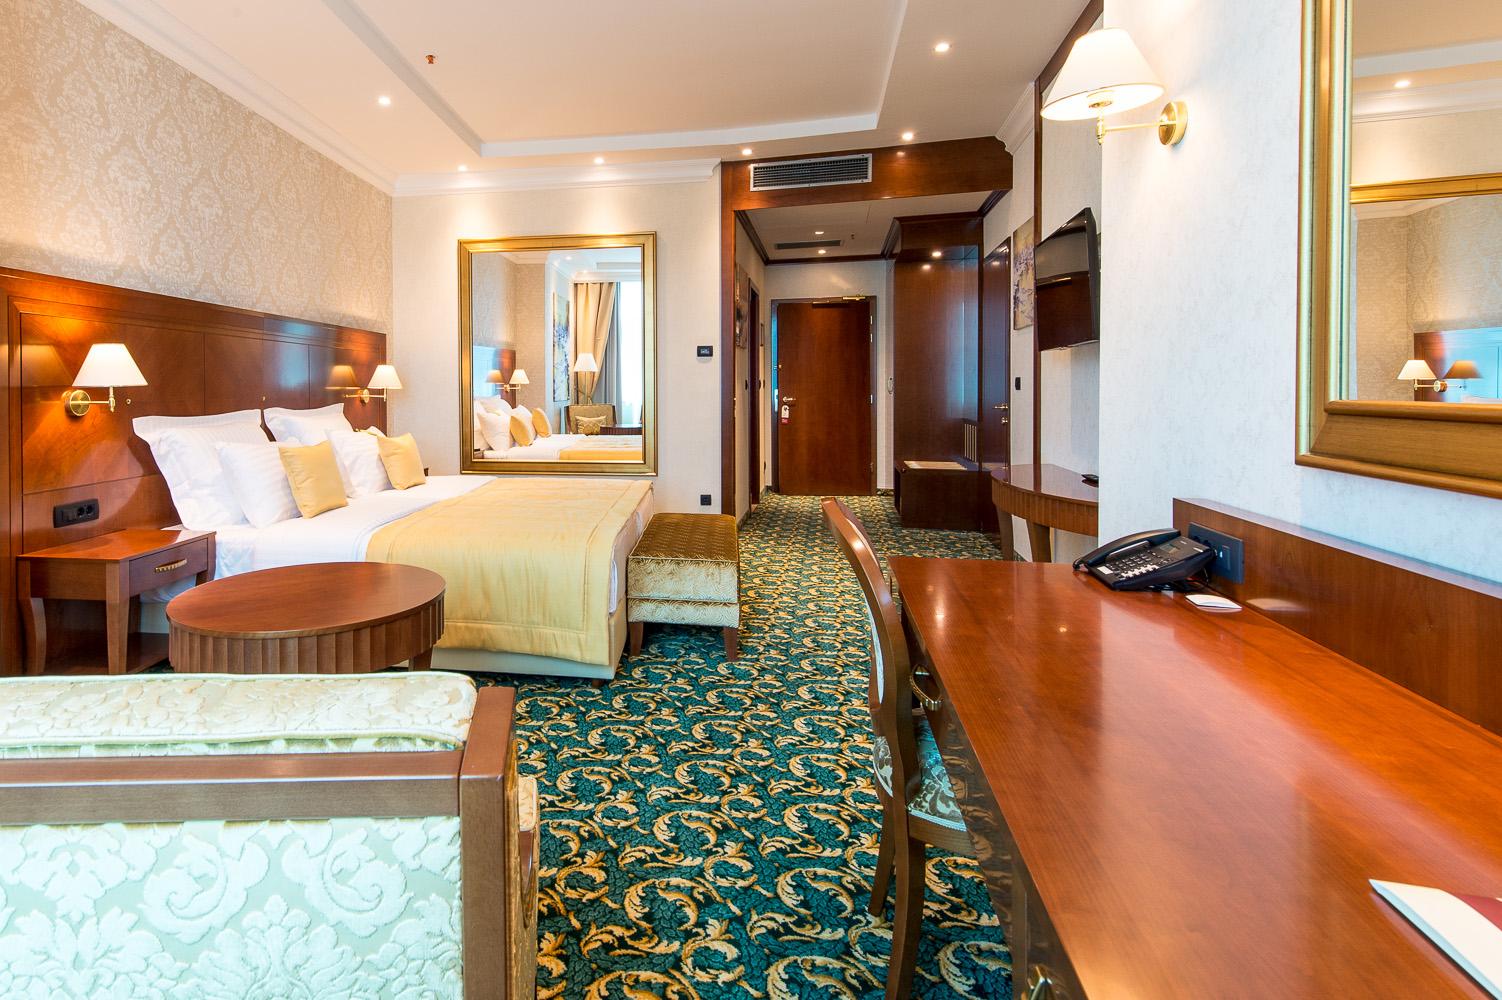 hotel-Mellain-Tuzla_oprema-javnega-dela_hotelske-sobe_oprema-hotela_hotel-furniture_lobby_restaurant_classic-furniture_14